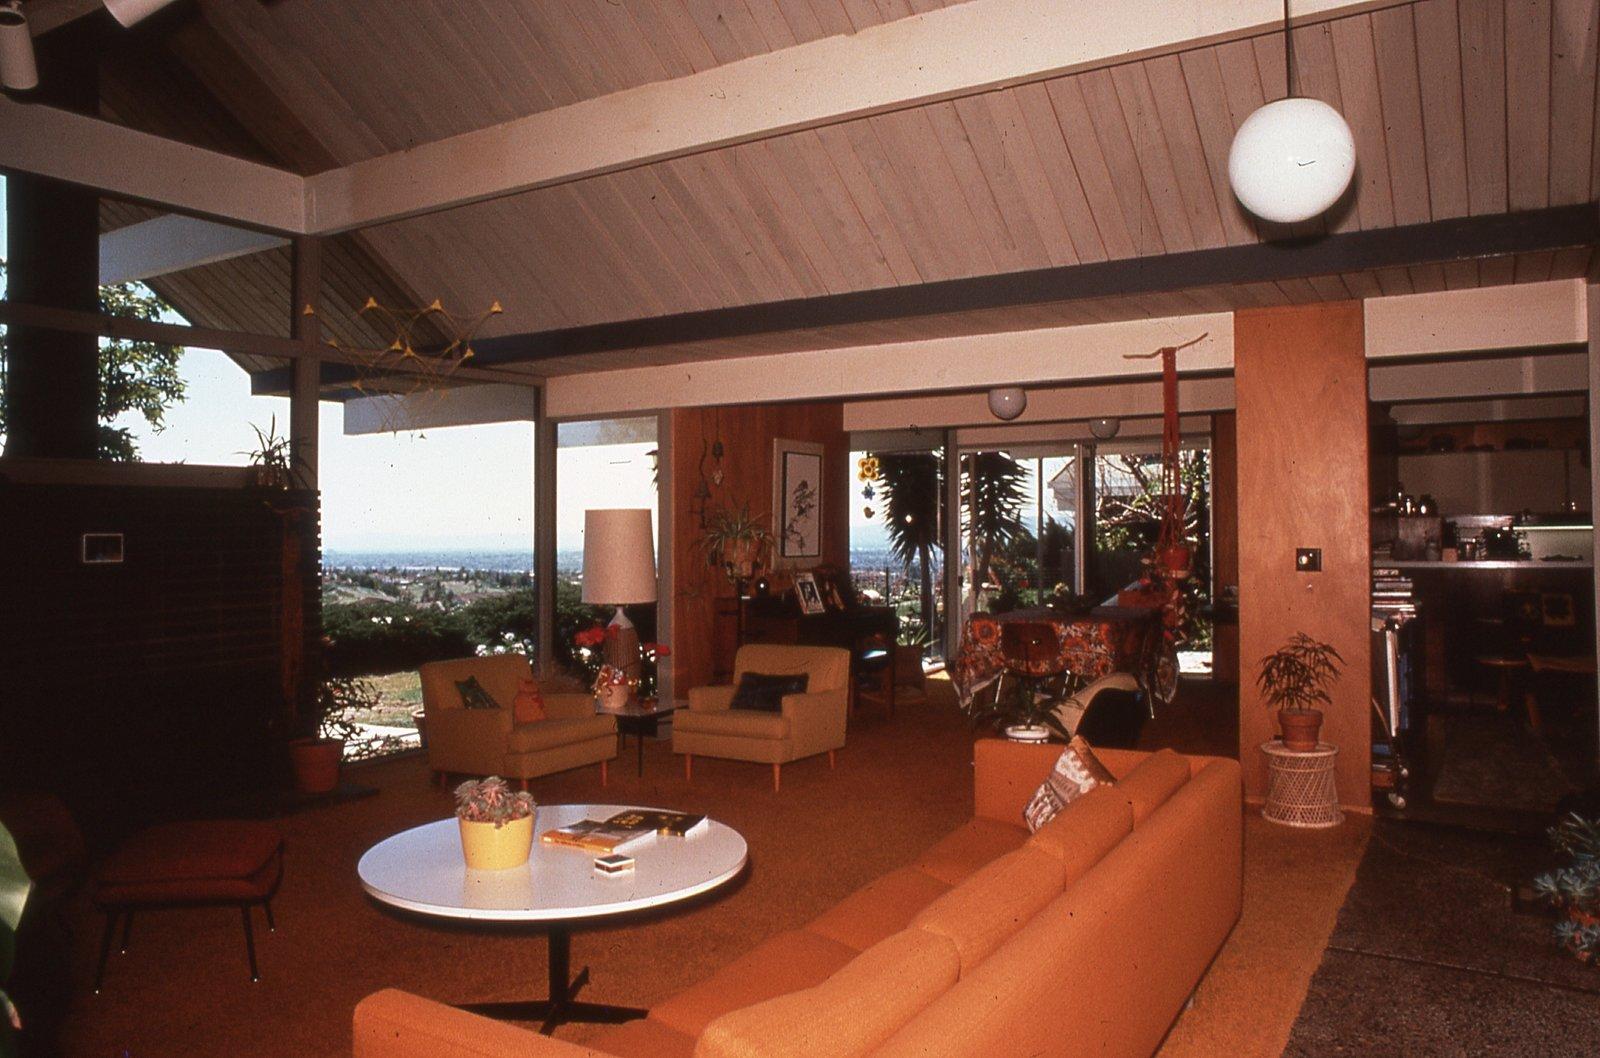 Living room, Balboa Highlands, Granada Hills, California, by Joseph Eichler.  Photo 6 of 6 in Never-Before-Seen Images of Iconic Midcentury Modern Eichler Homes